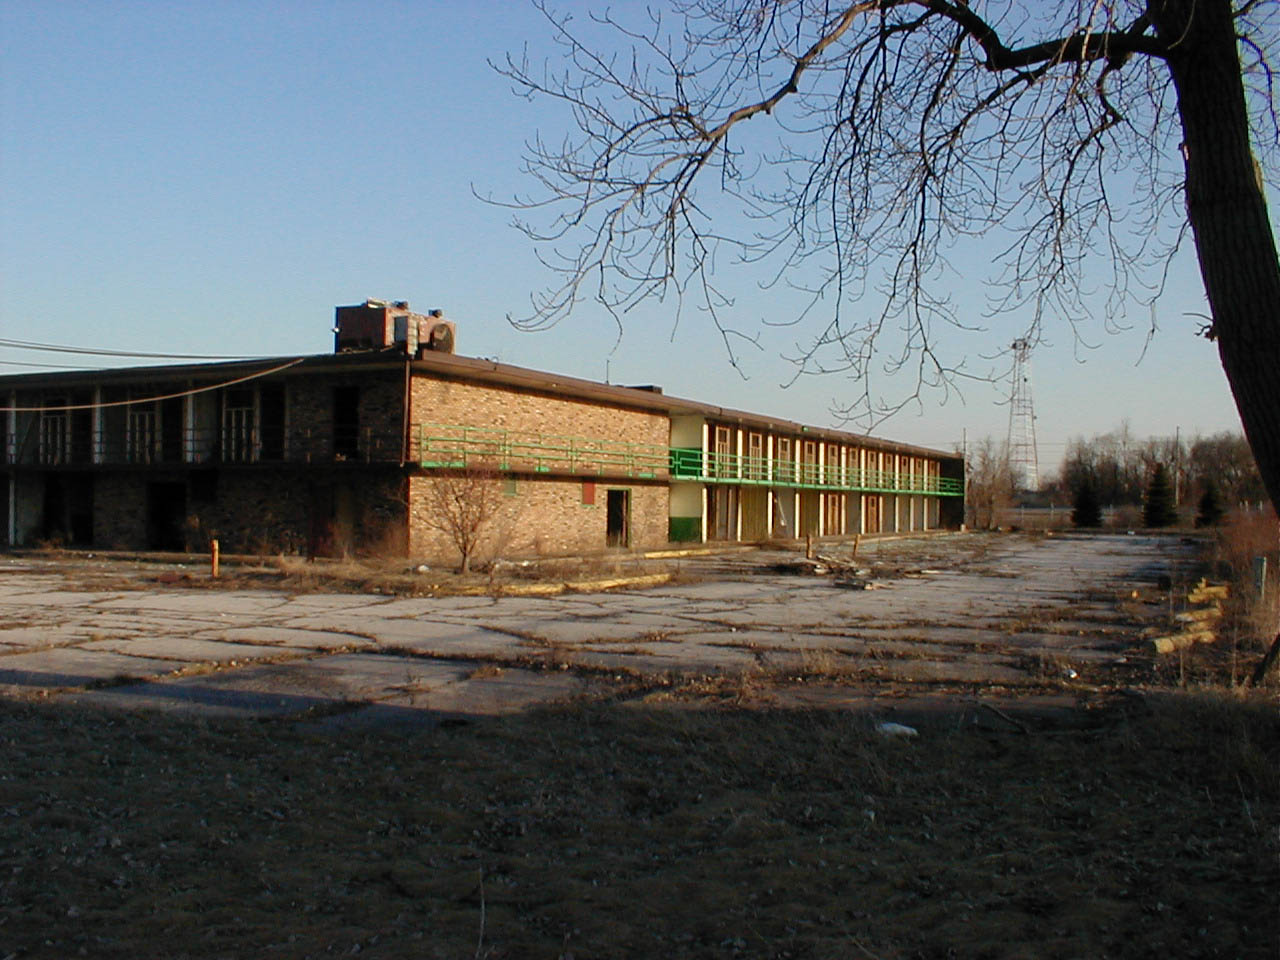 Holiday Inn [Gary]   Lost Indiana